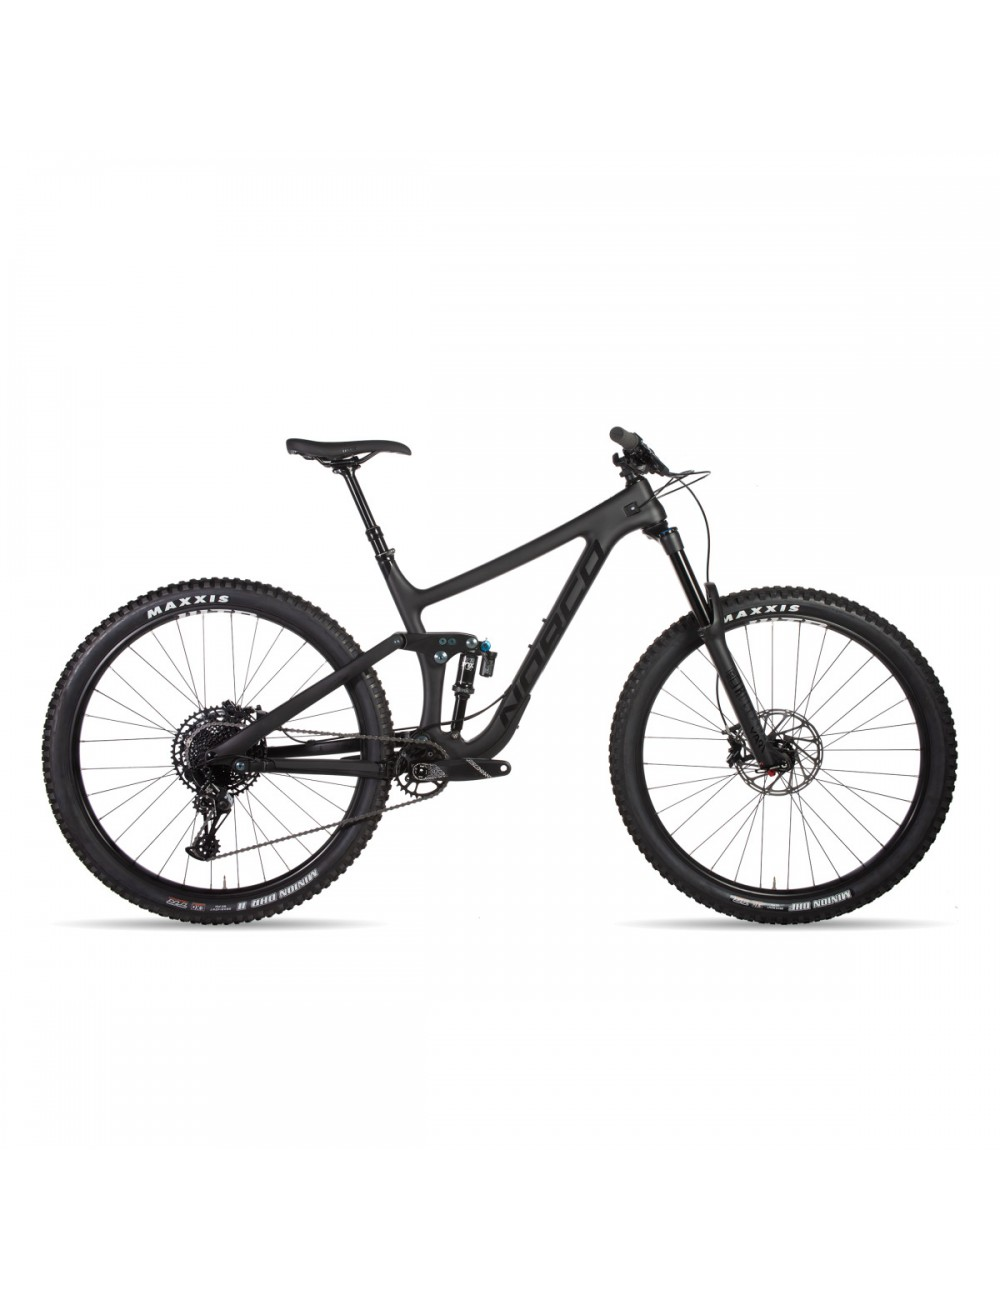 Norco Range C7.3 Bike - Flat Black_11757